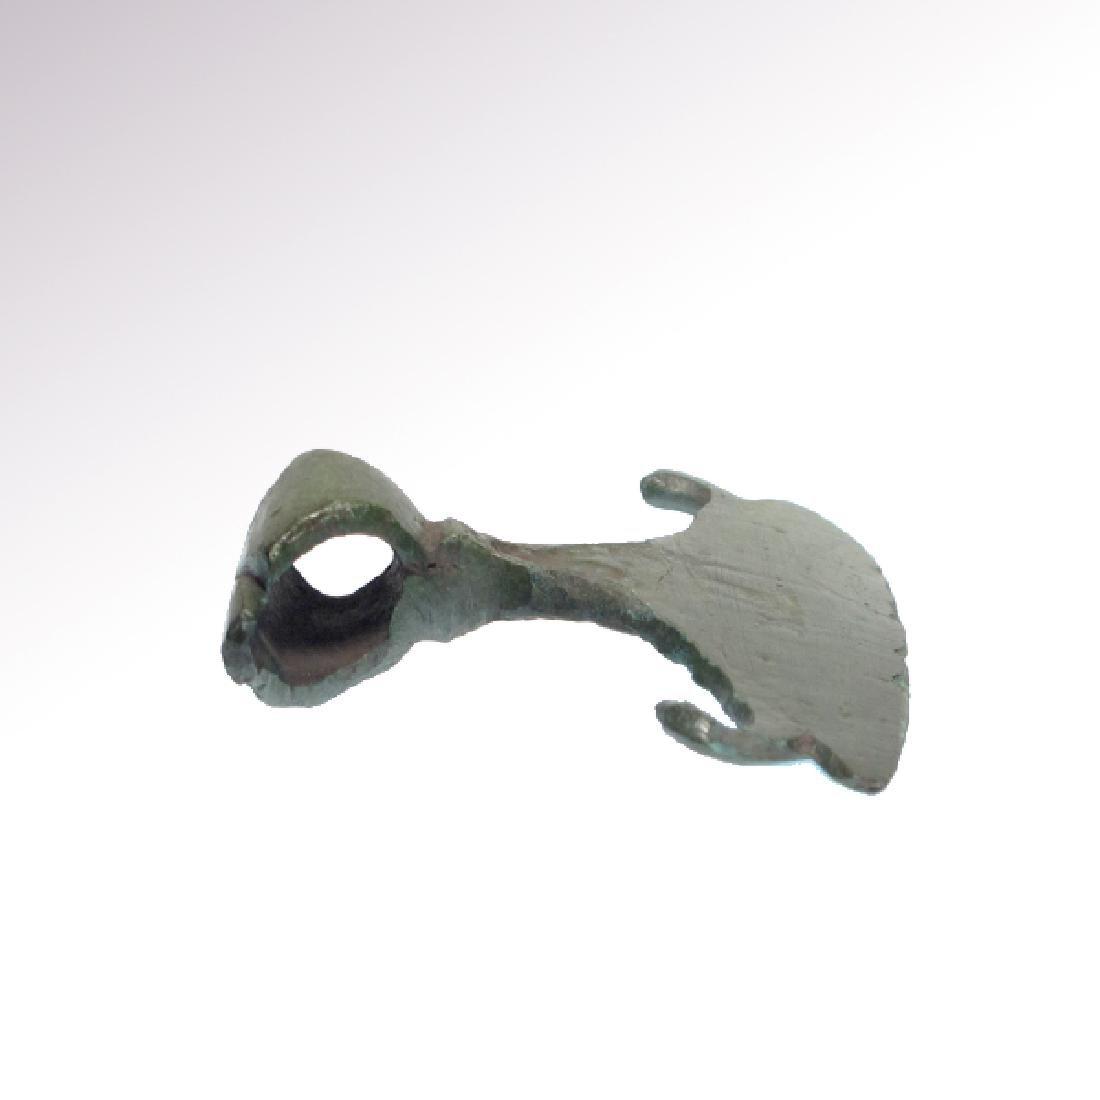 Viking Bronze Large AxePendant, c. 9-10th Century A.D. - 6